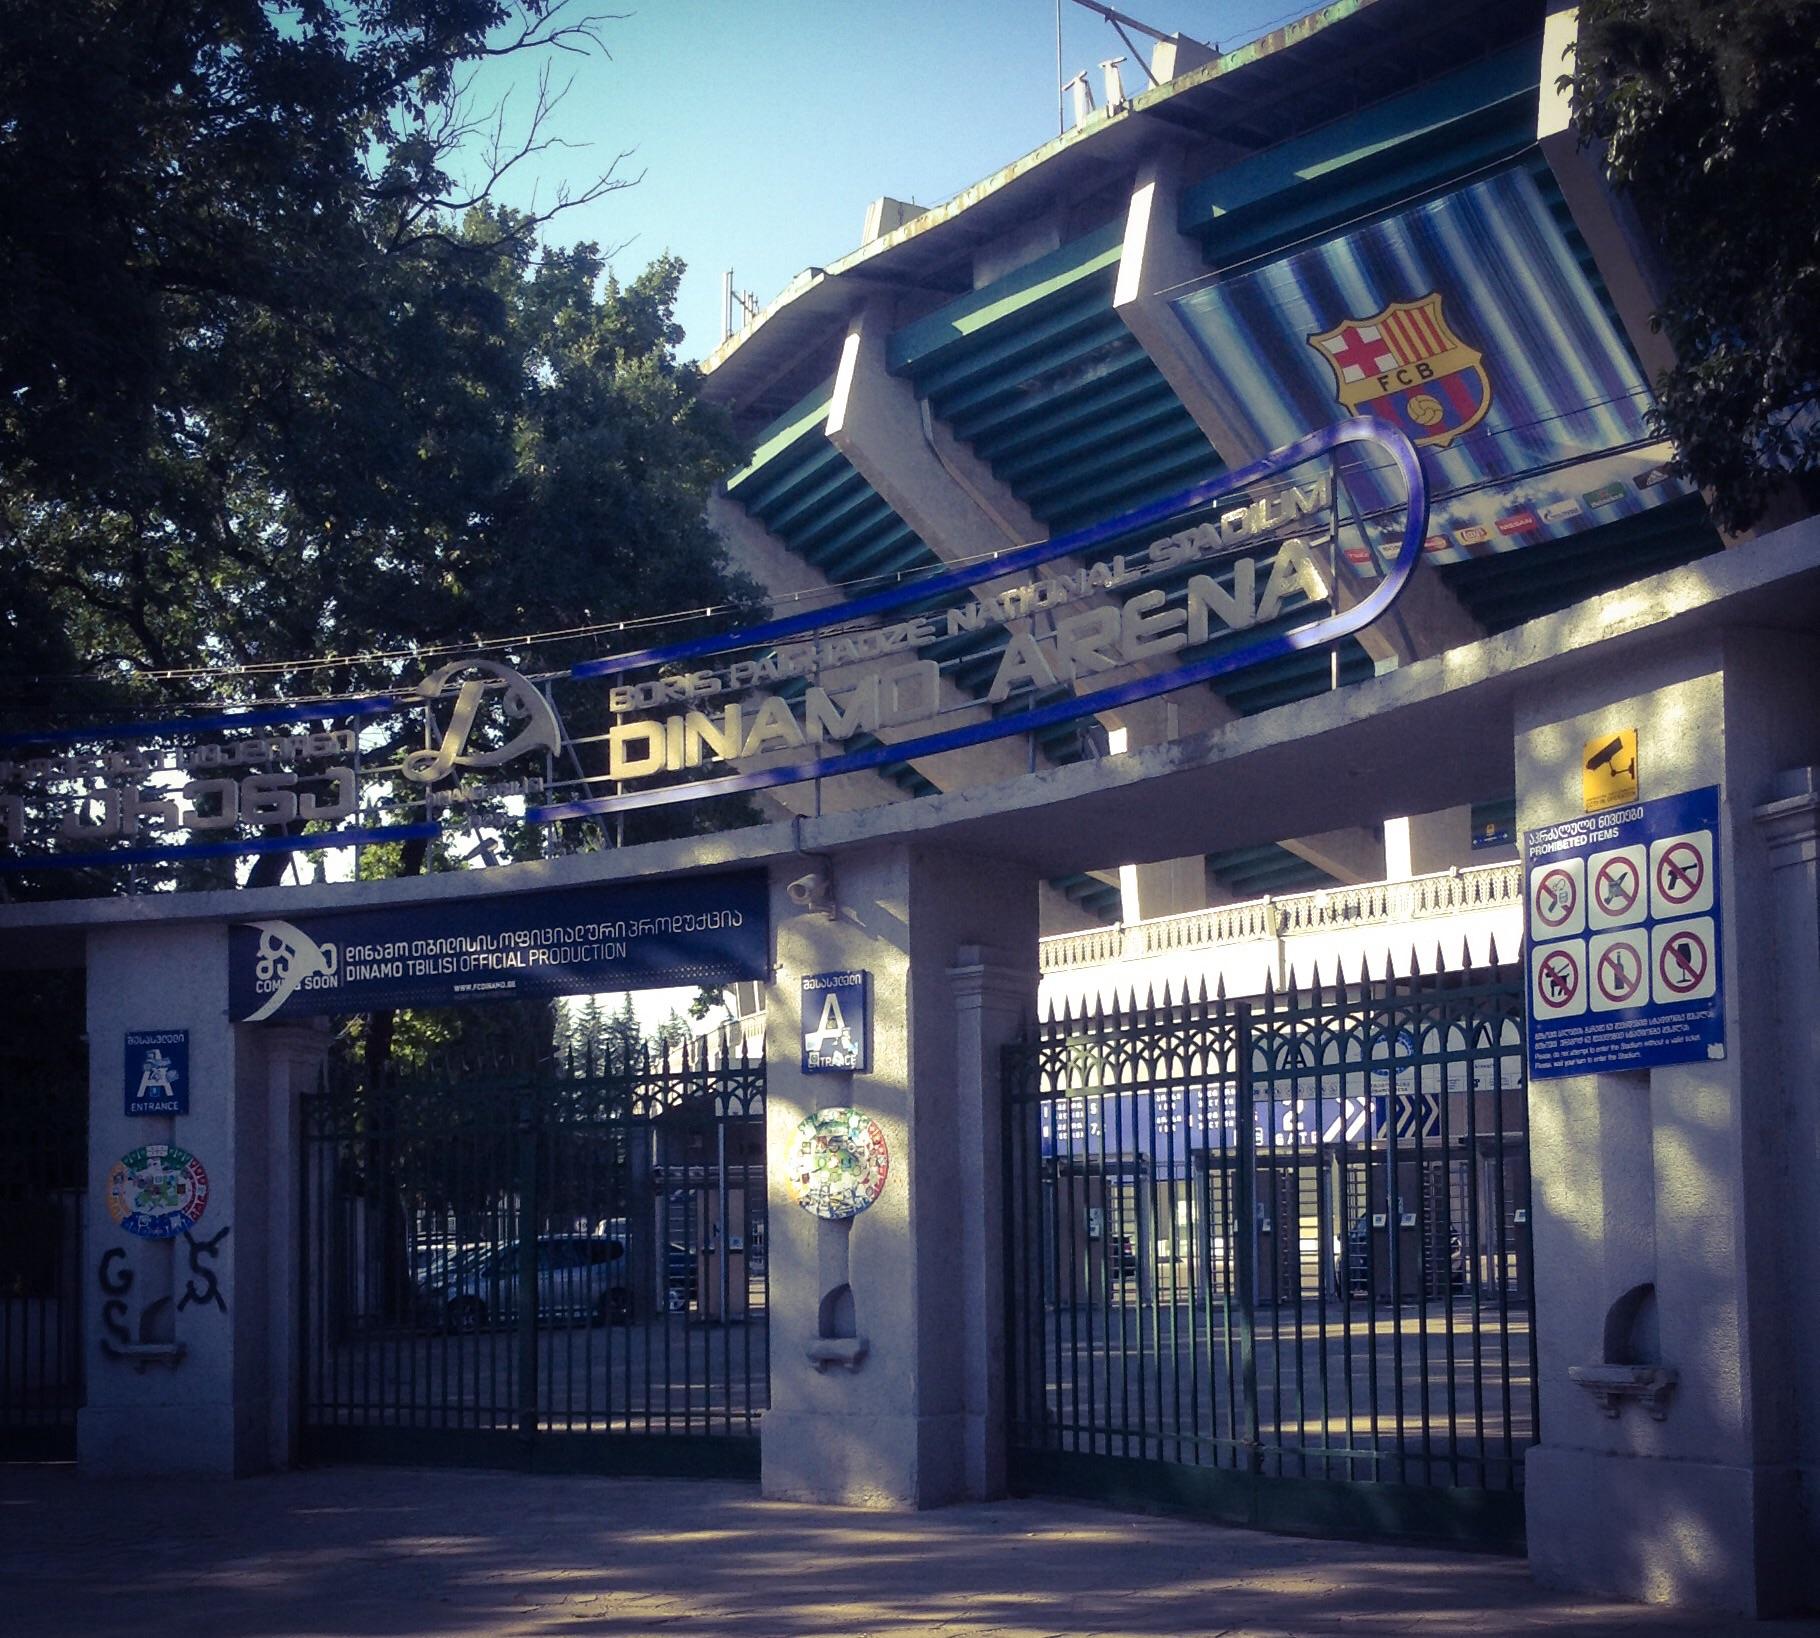 UEFA Super Cup – Introducing The Boris Paichadze Dinamo Arena